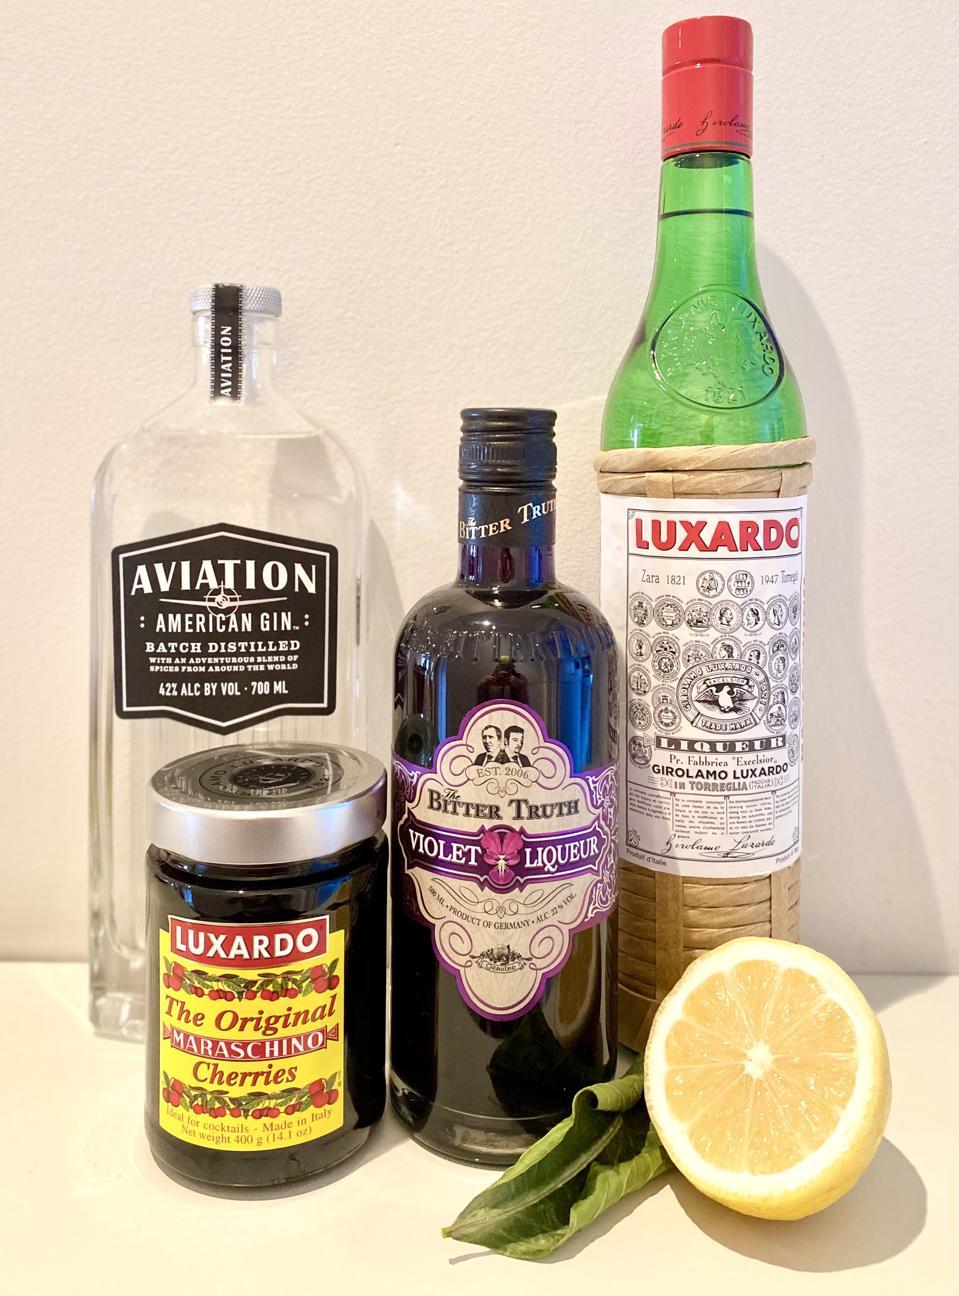 Aviation Ingredients: Aviation Gin; The Bitter Truth Violet Liqueur; Luxardo Marachino Liqueur; Lemon Juice; and Luxardo Marachino Cherry